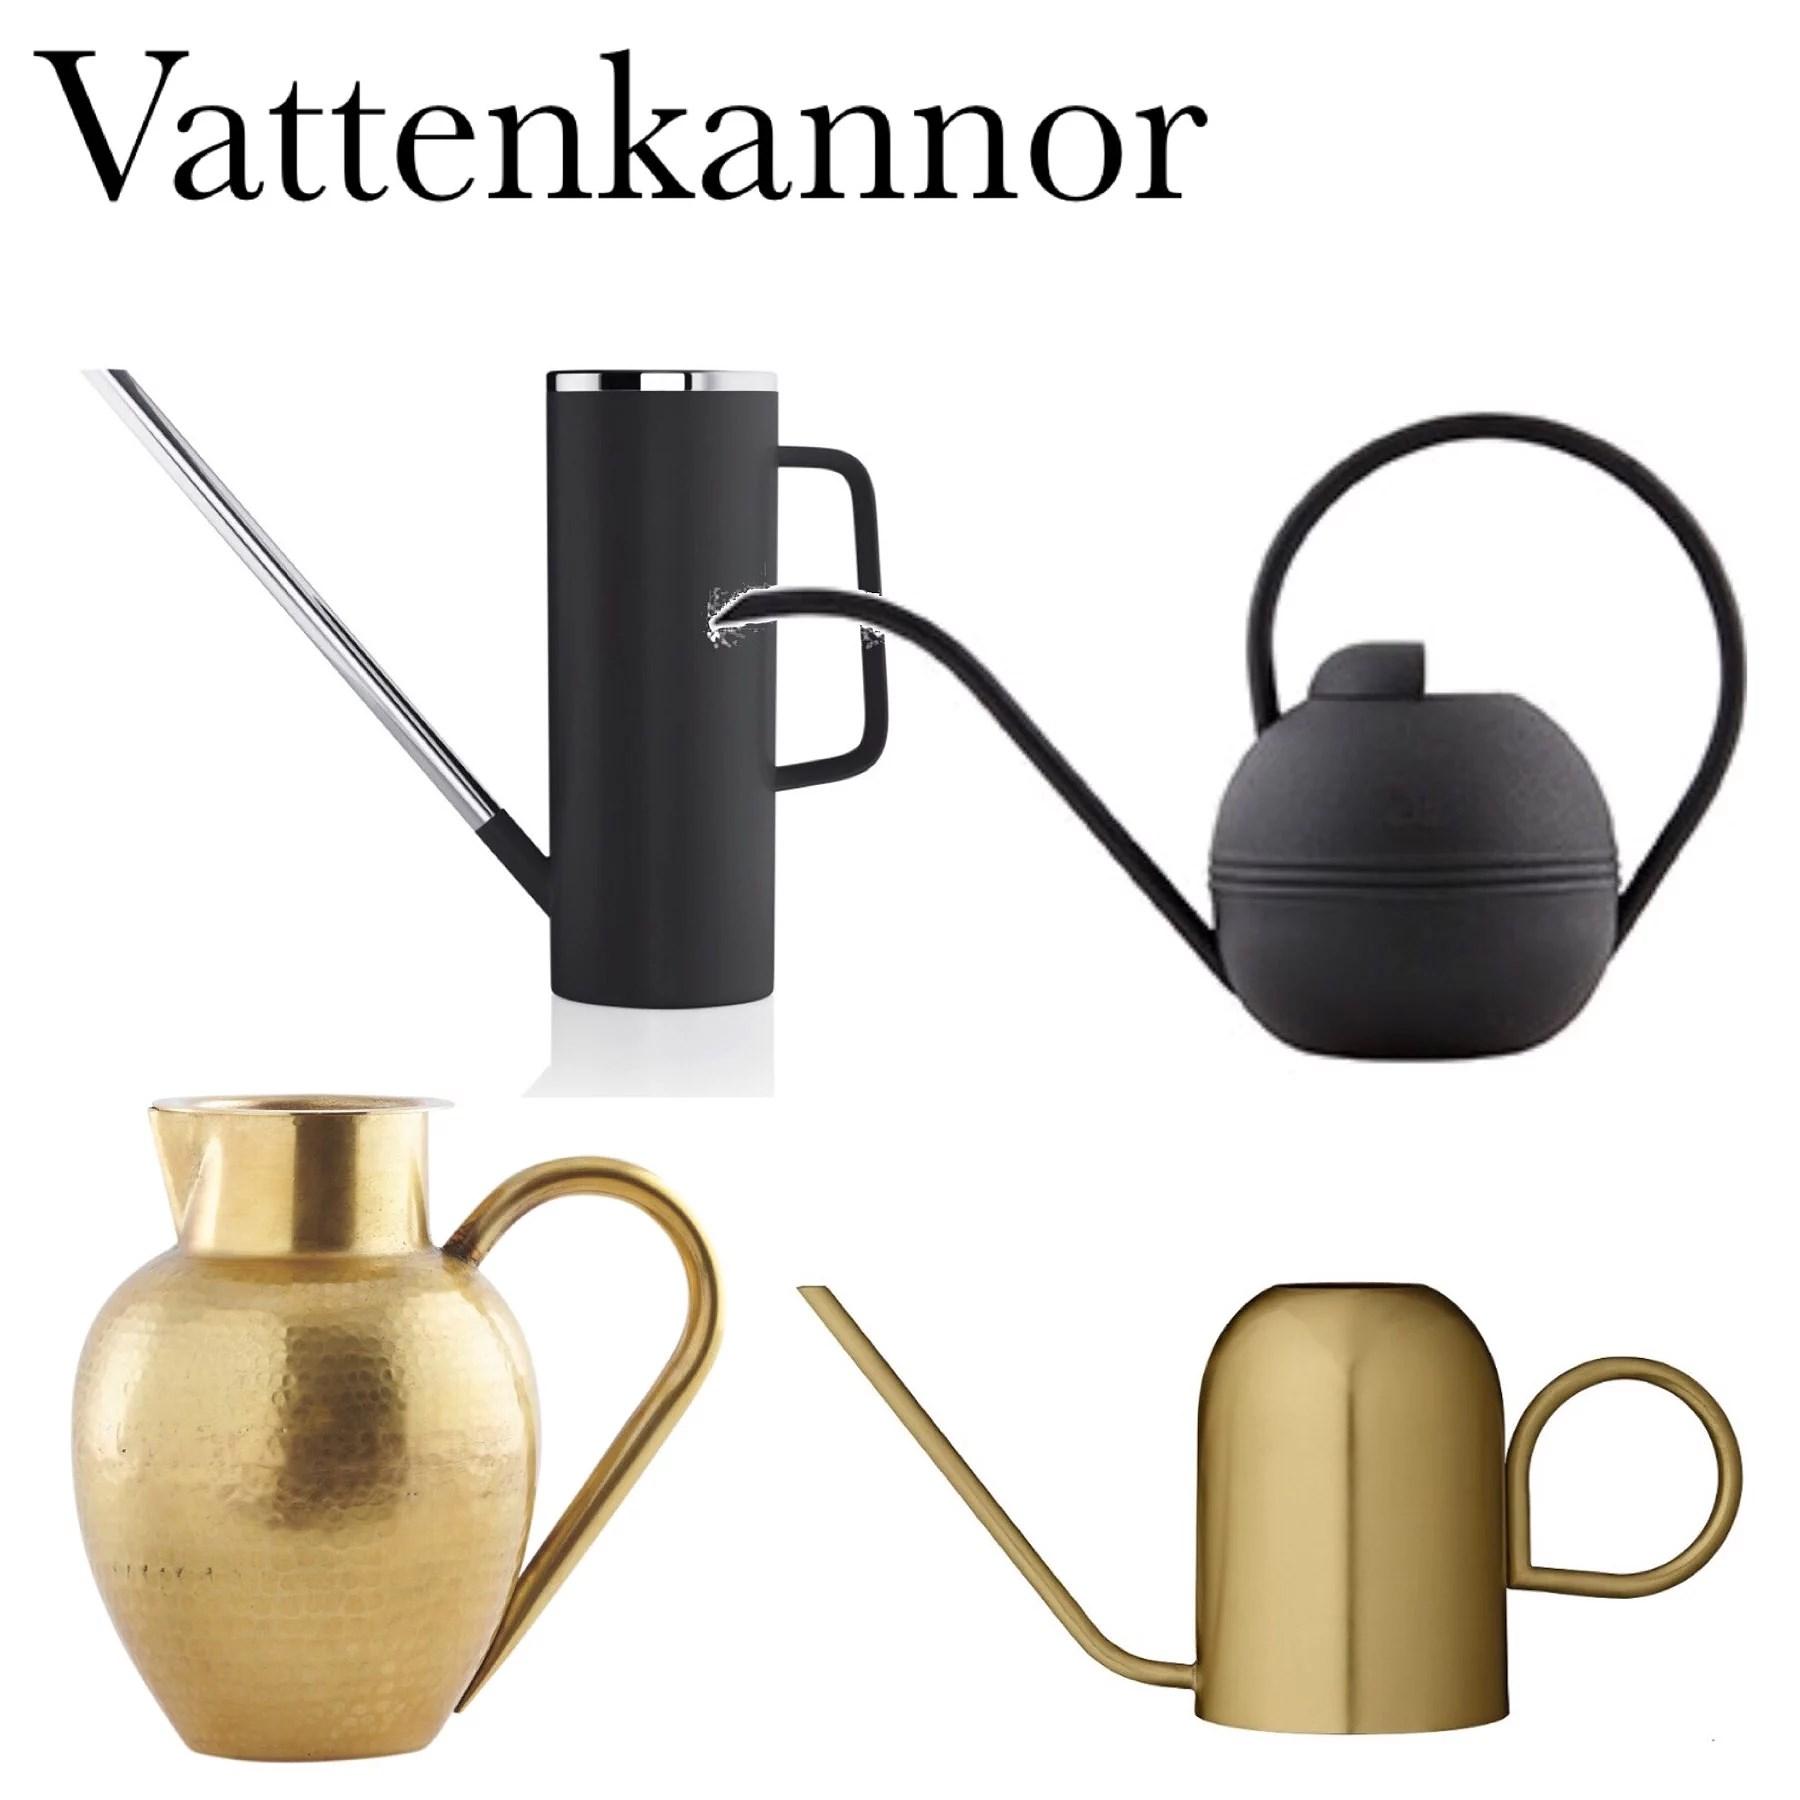 Vattenkannor - AYTM/Housedoctor/Blomus